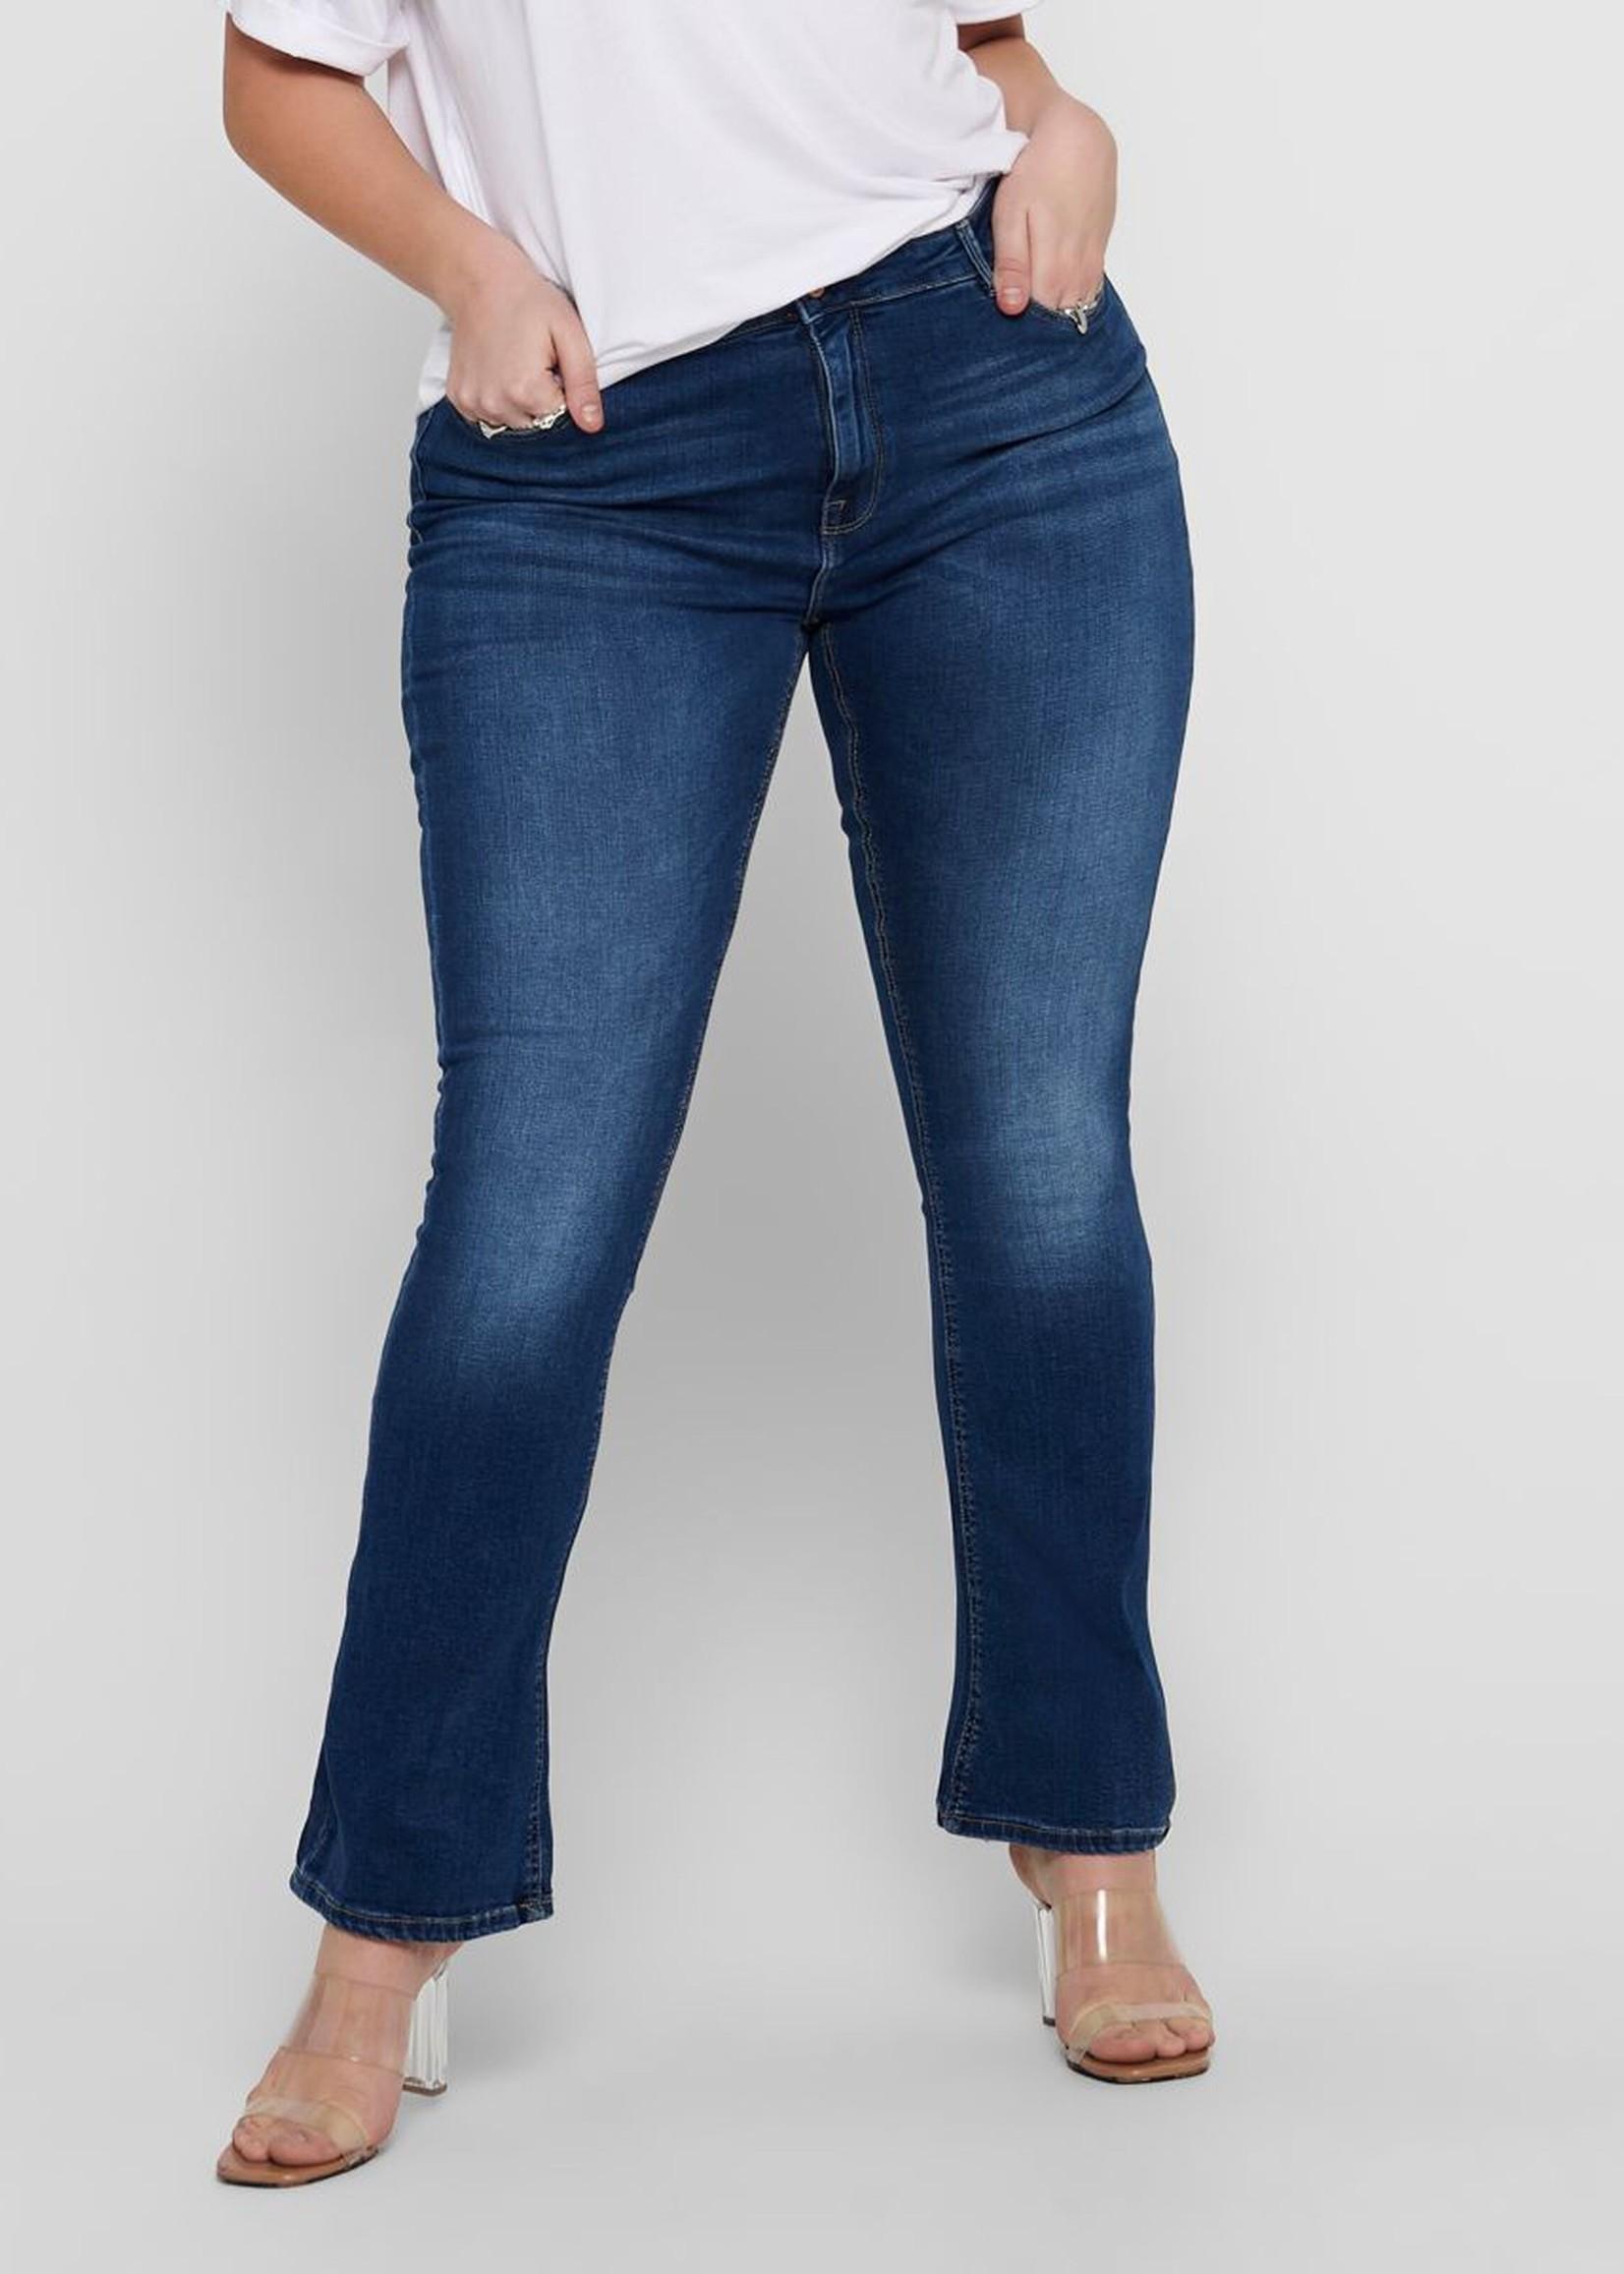 Only Carmakoma Only Carmakoma Laola Flared Jeans